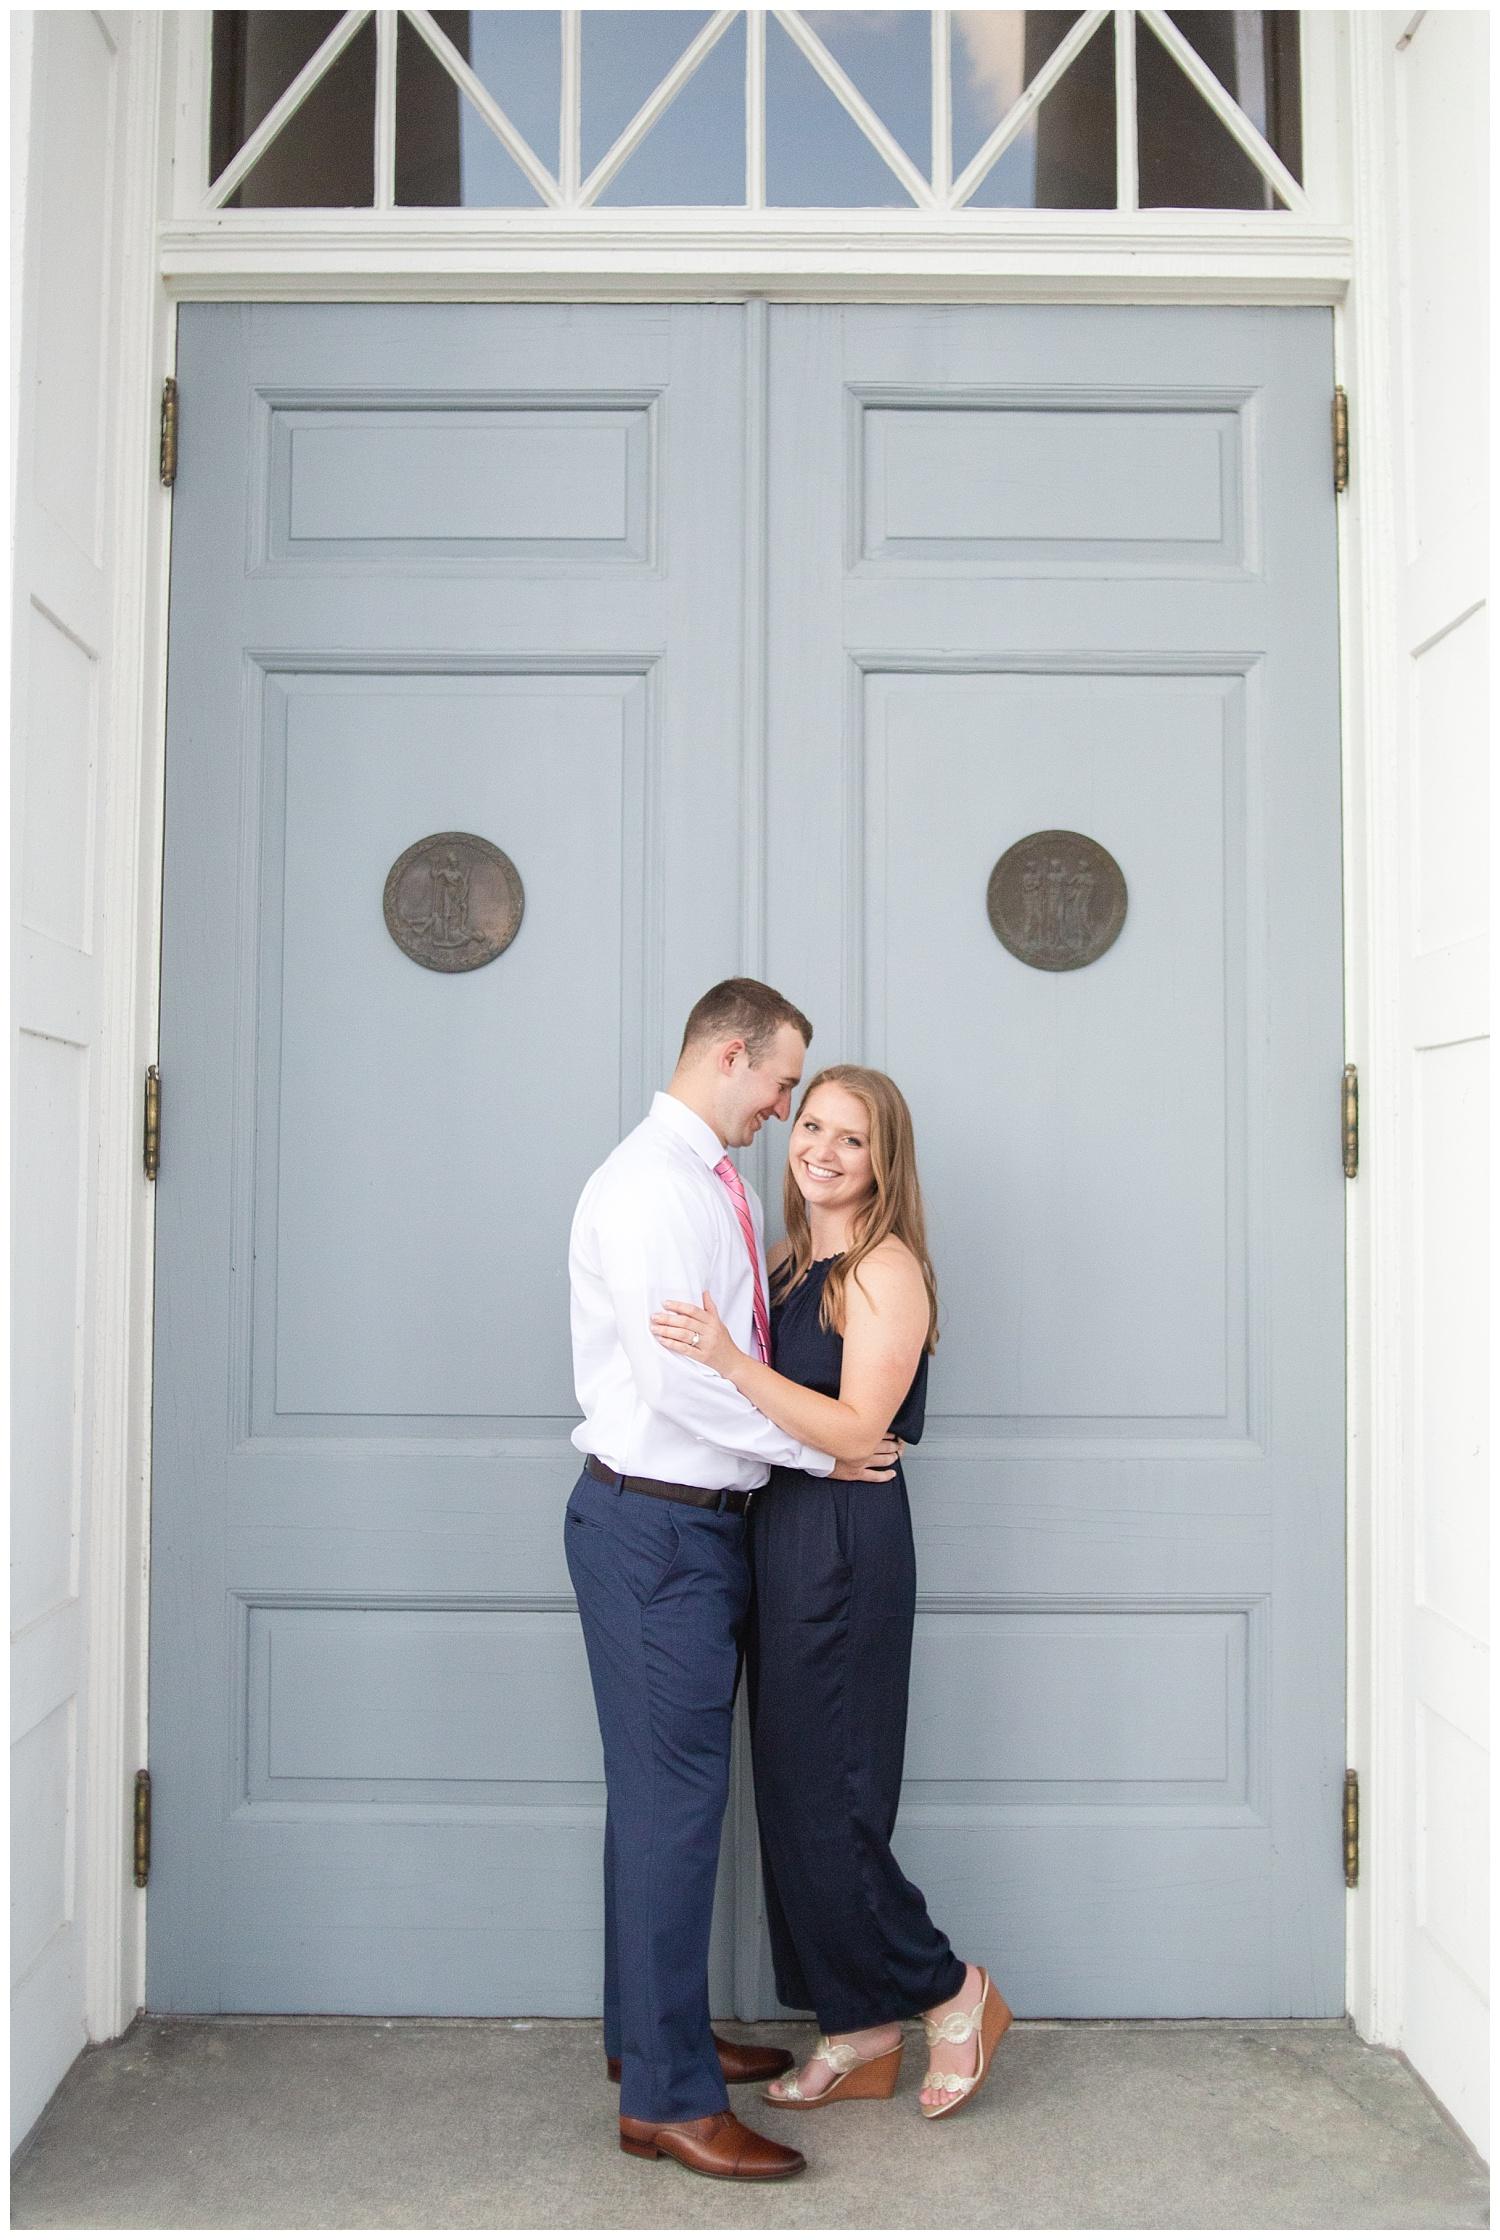 MJMP Richmond Wedding Photographer Summer Virginia State Capitol Engagement Session_0009.jpg